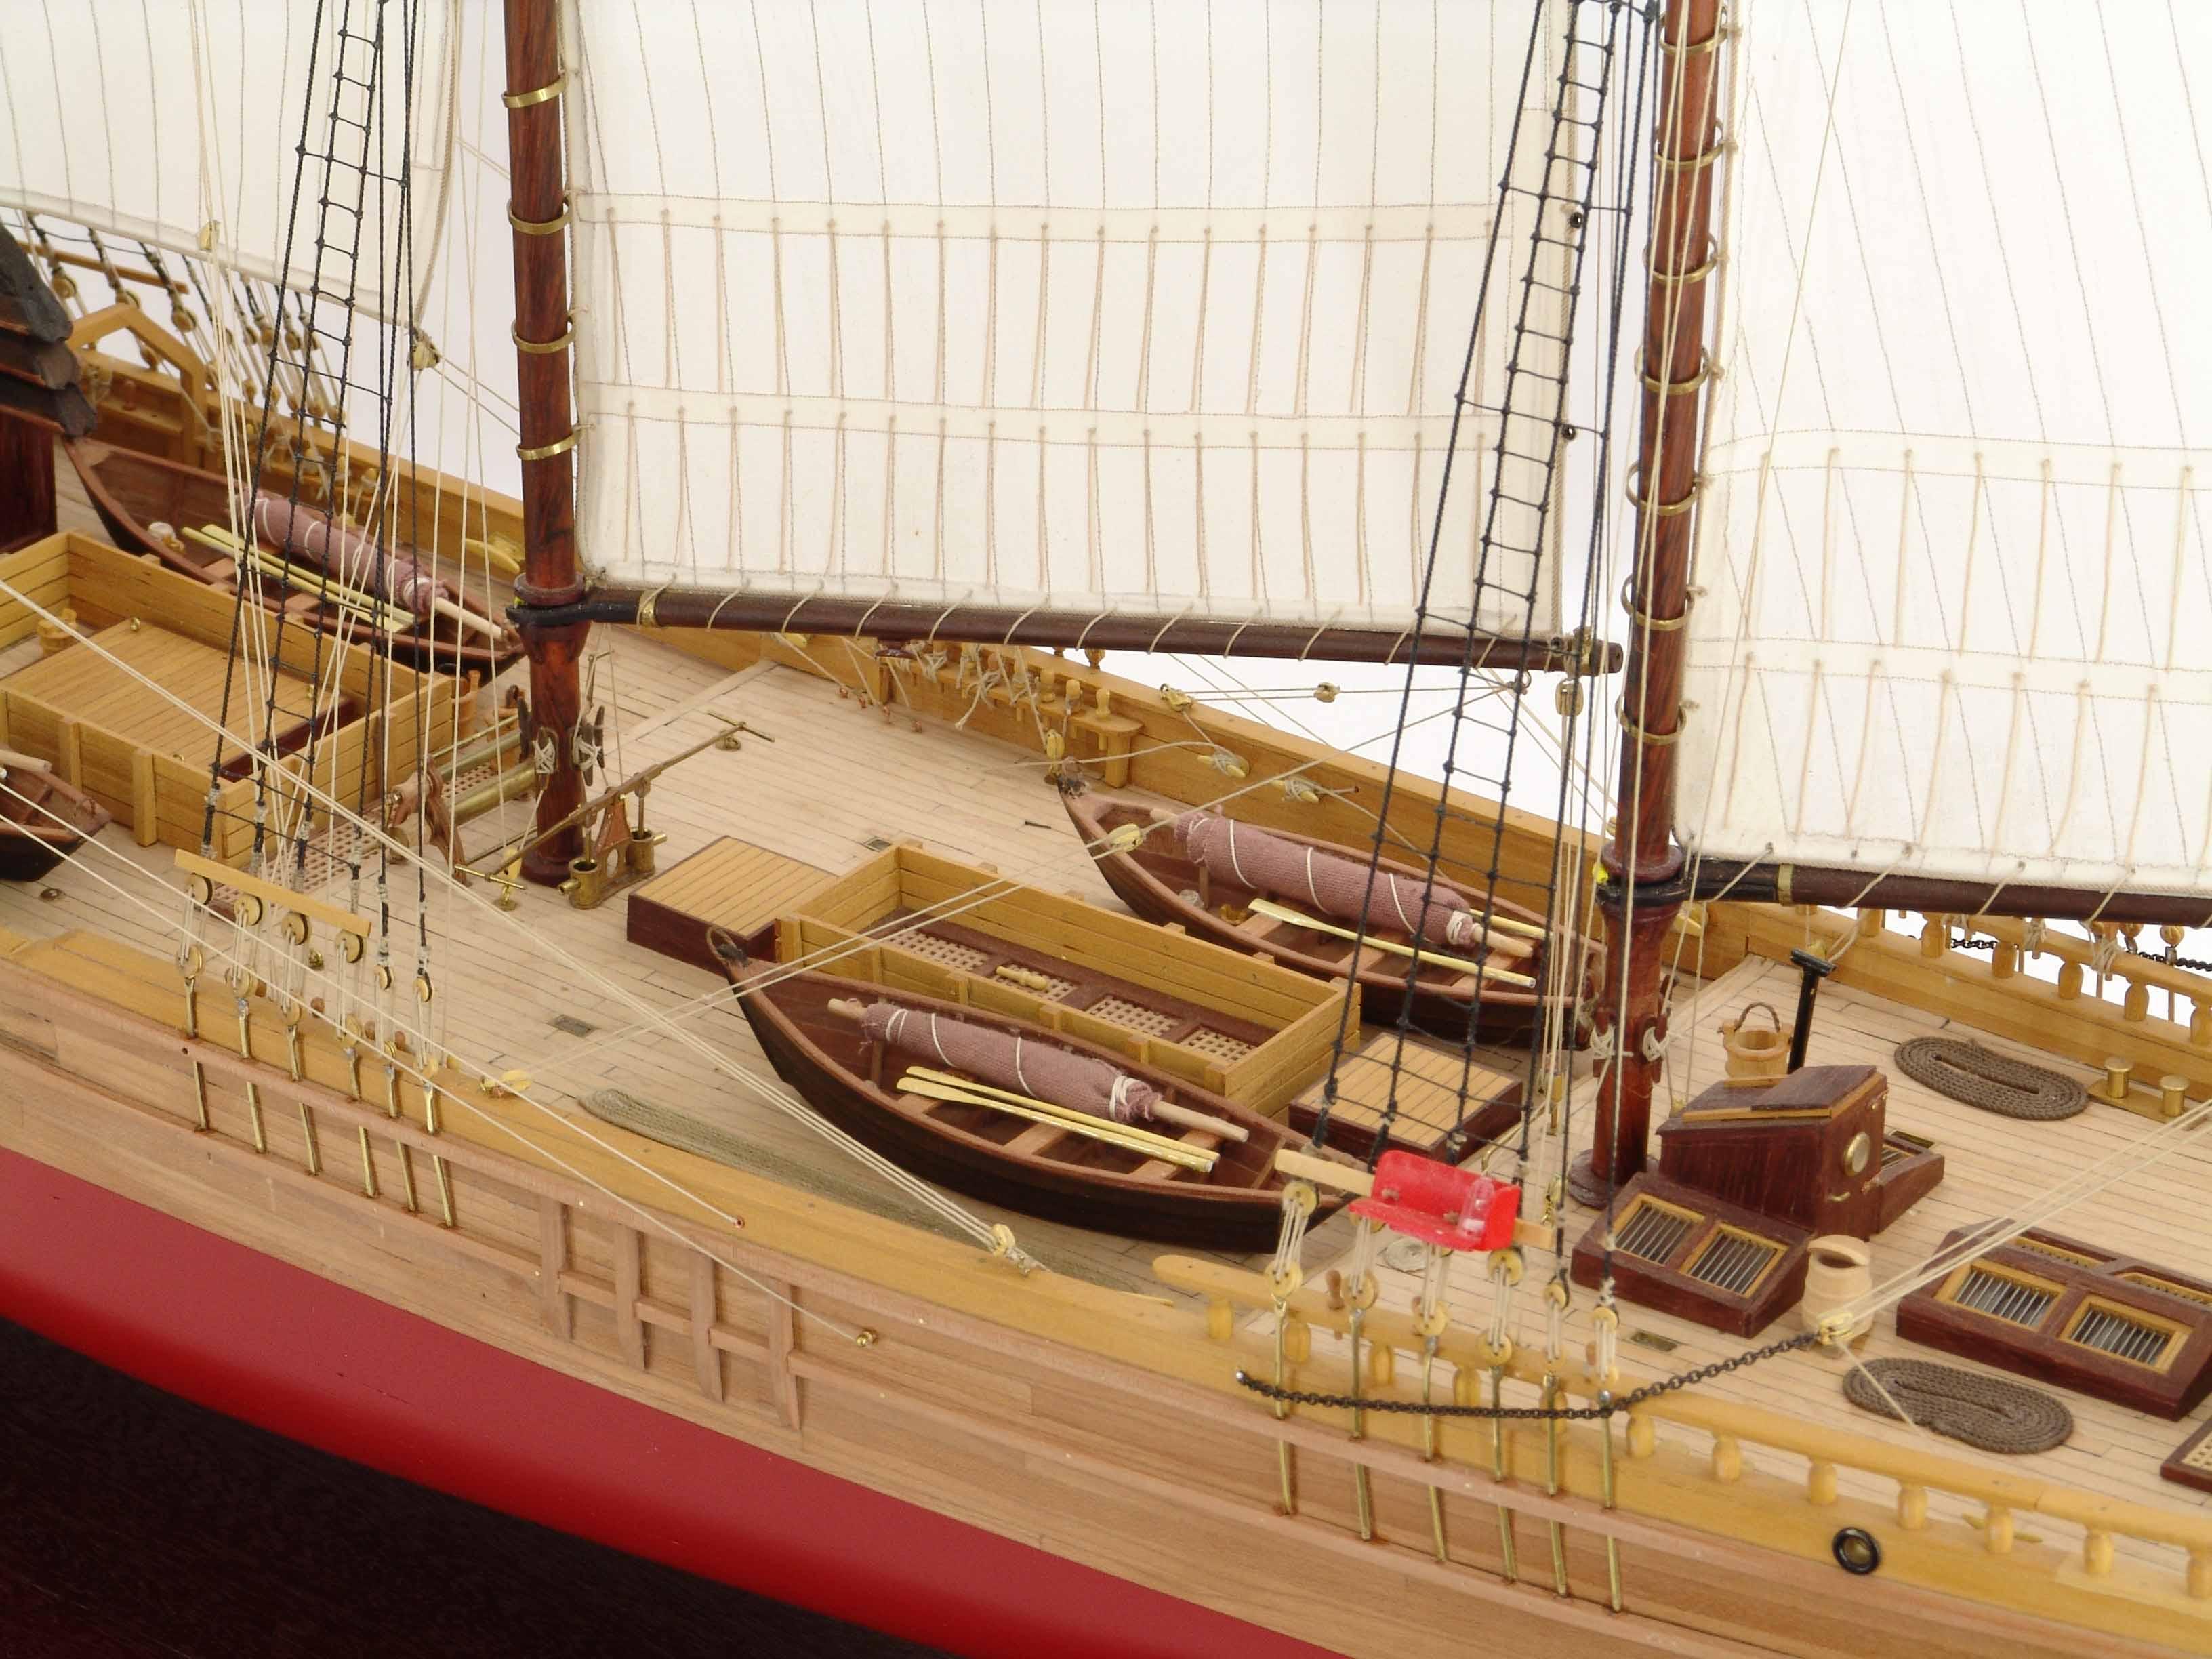 Photos barquentine model COTE D'ÉMERAUDE